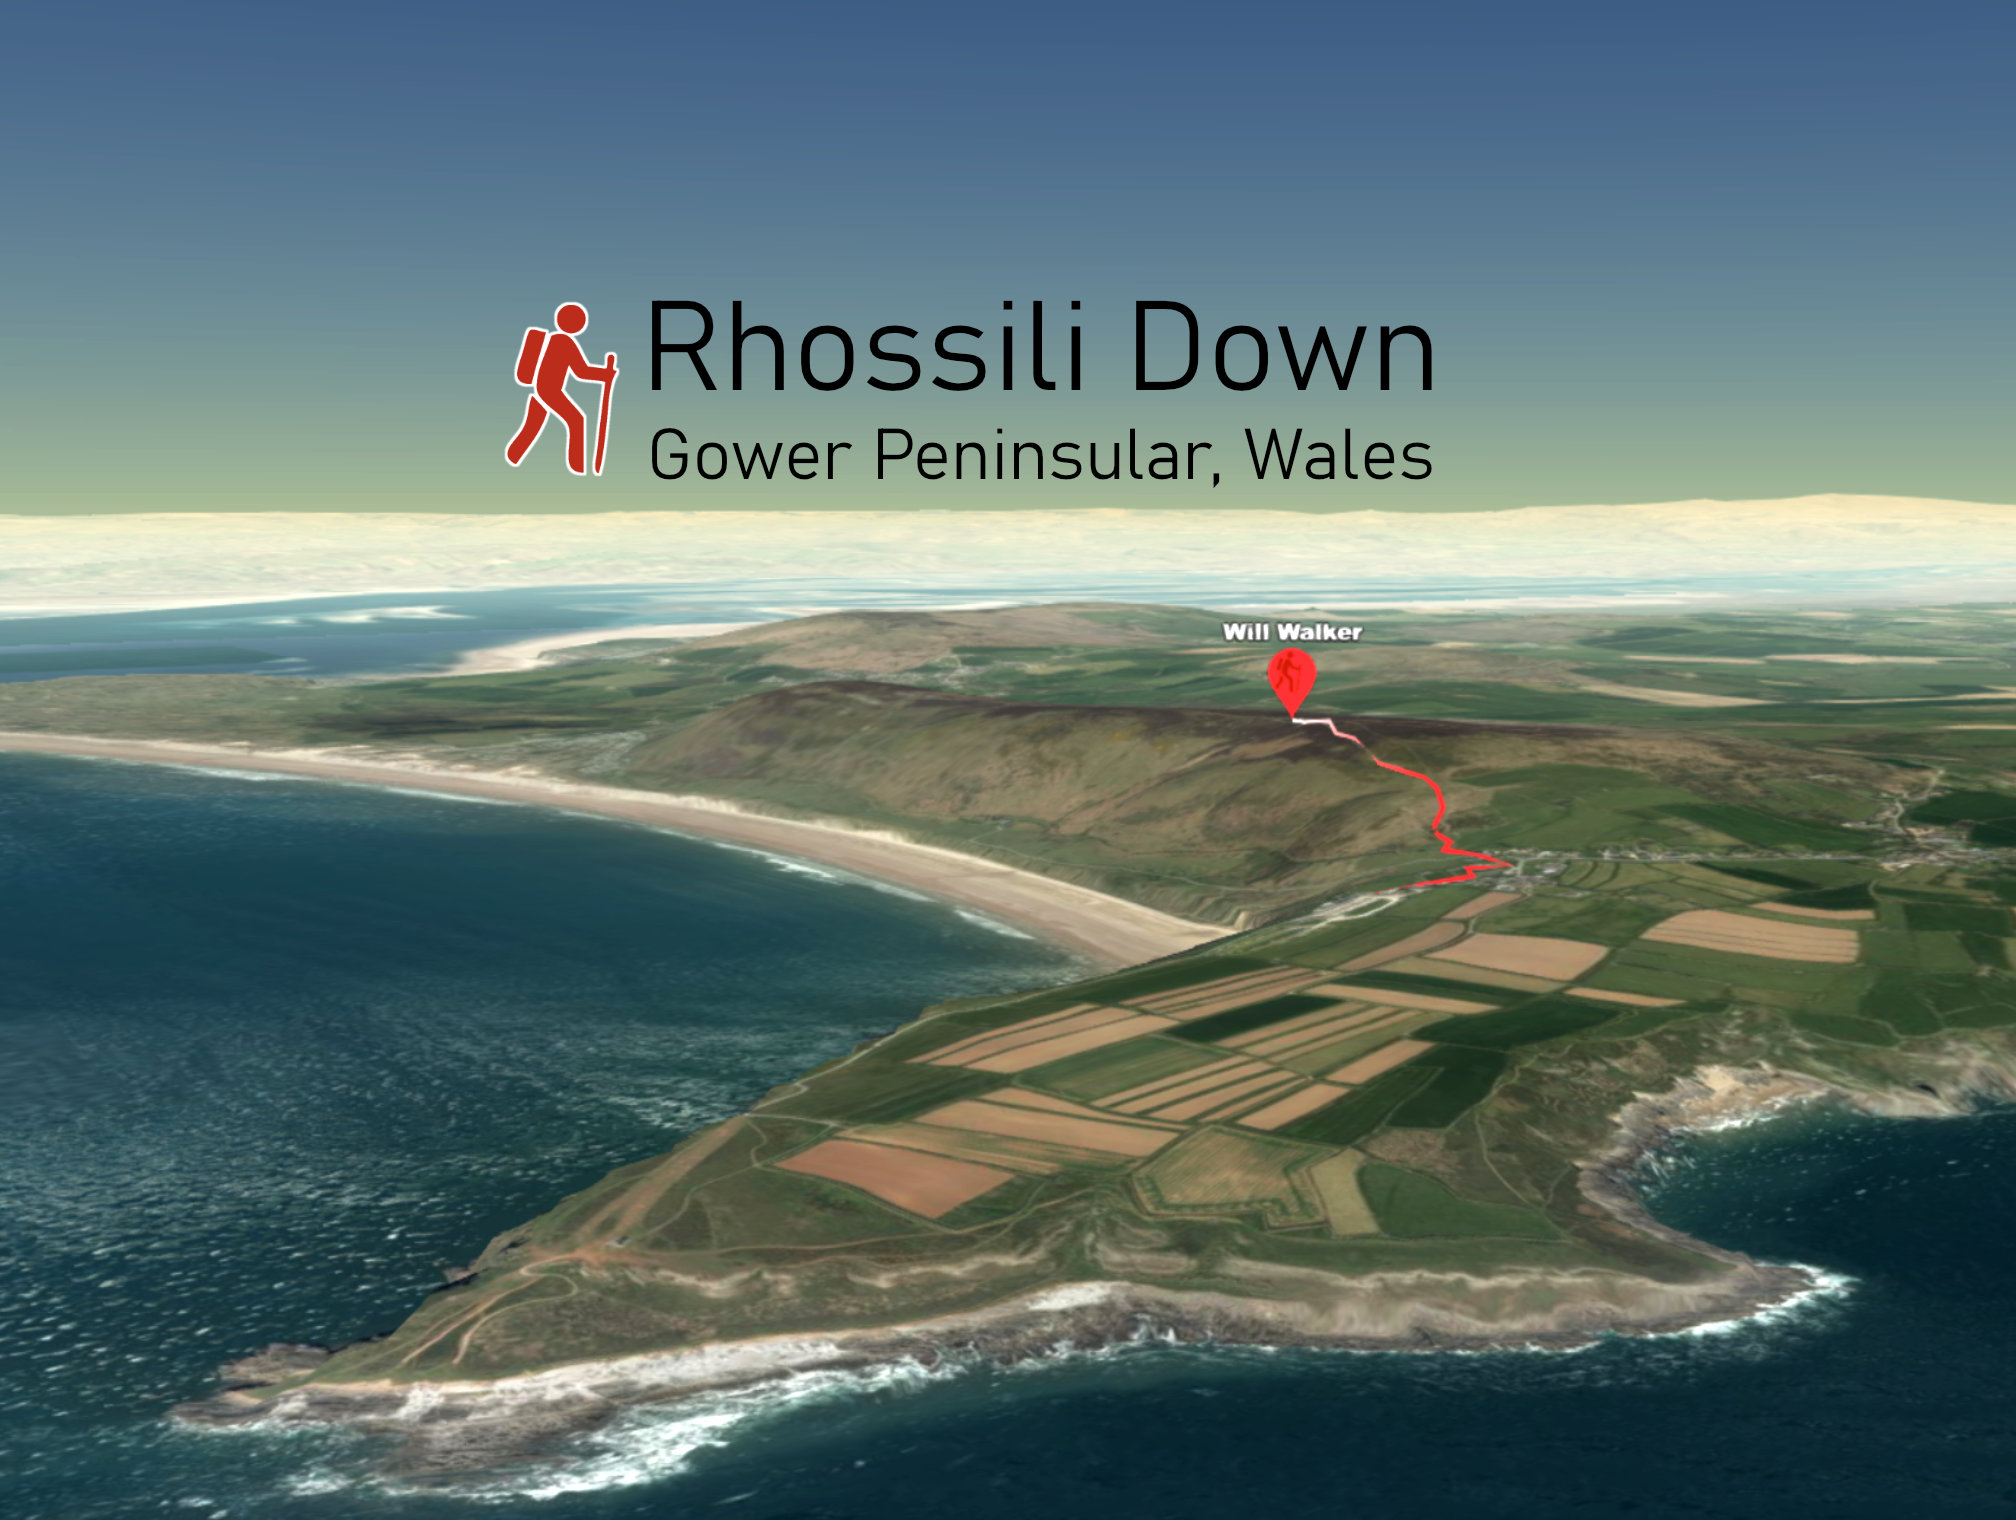 Rhossili Down 3D